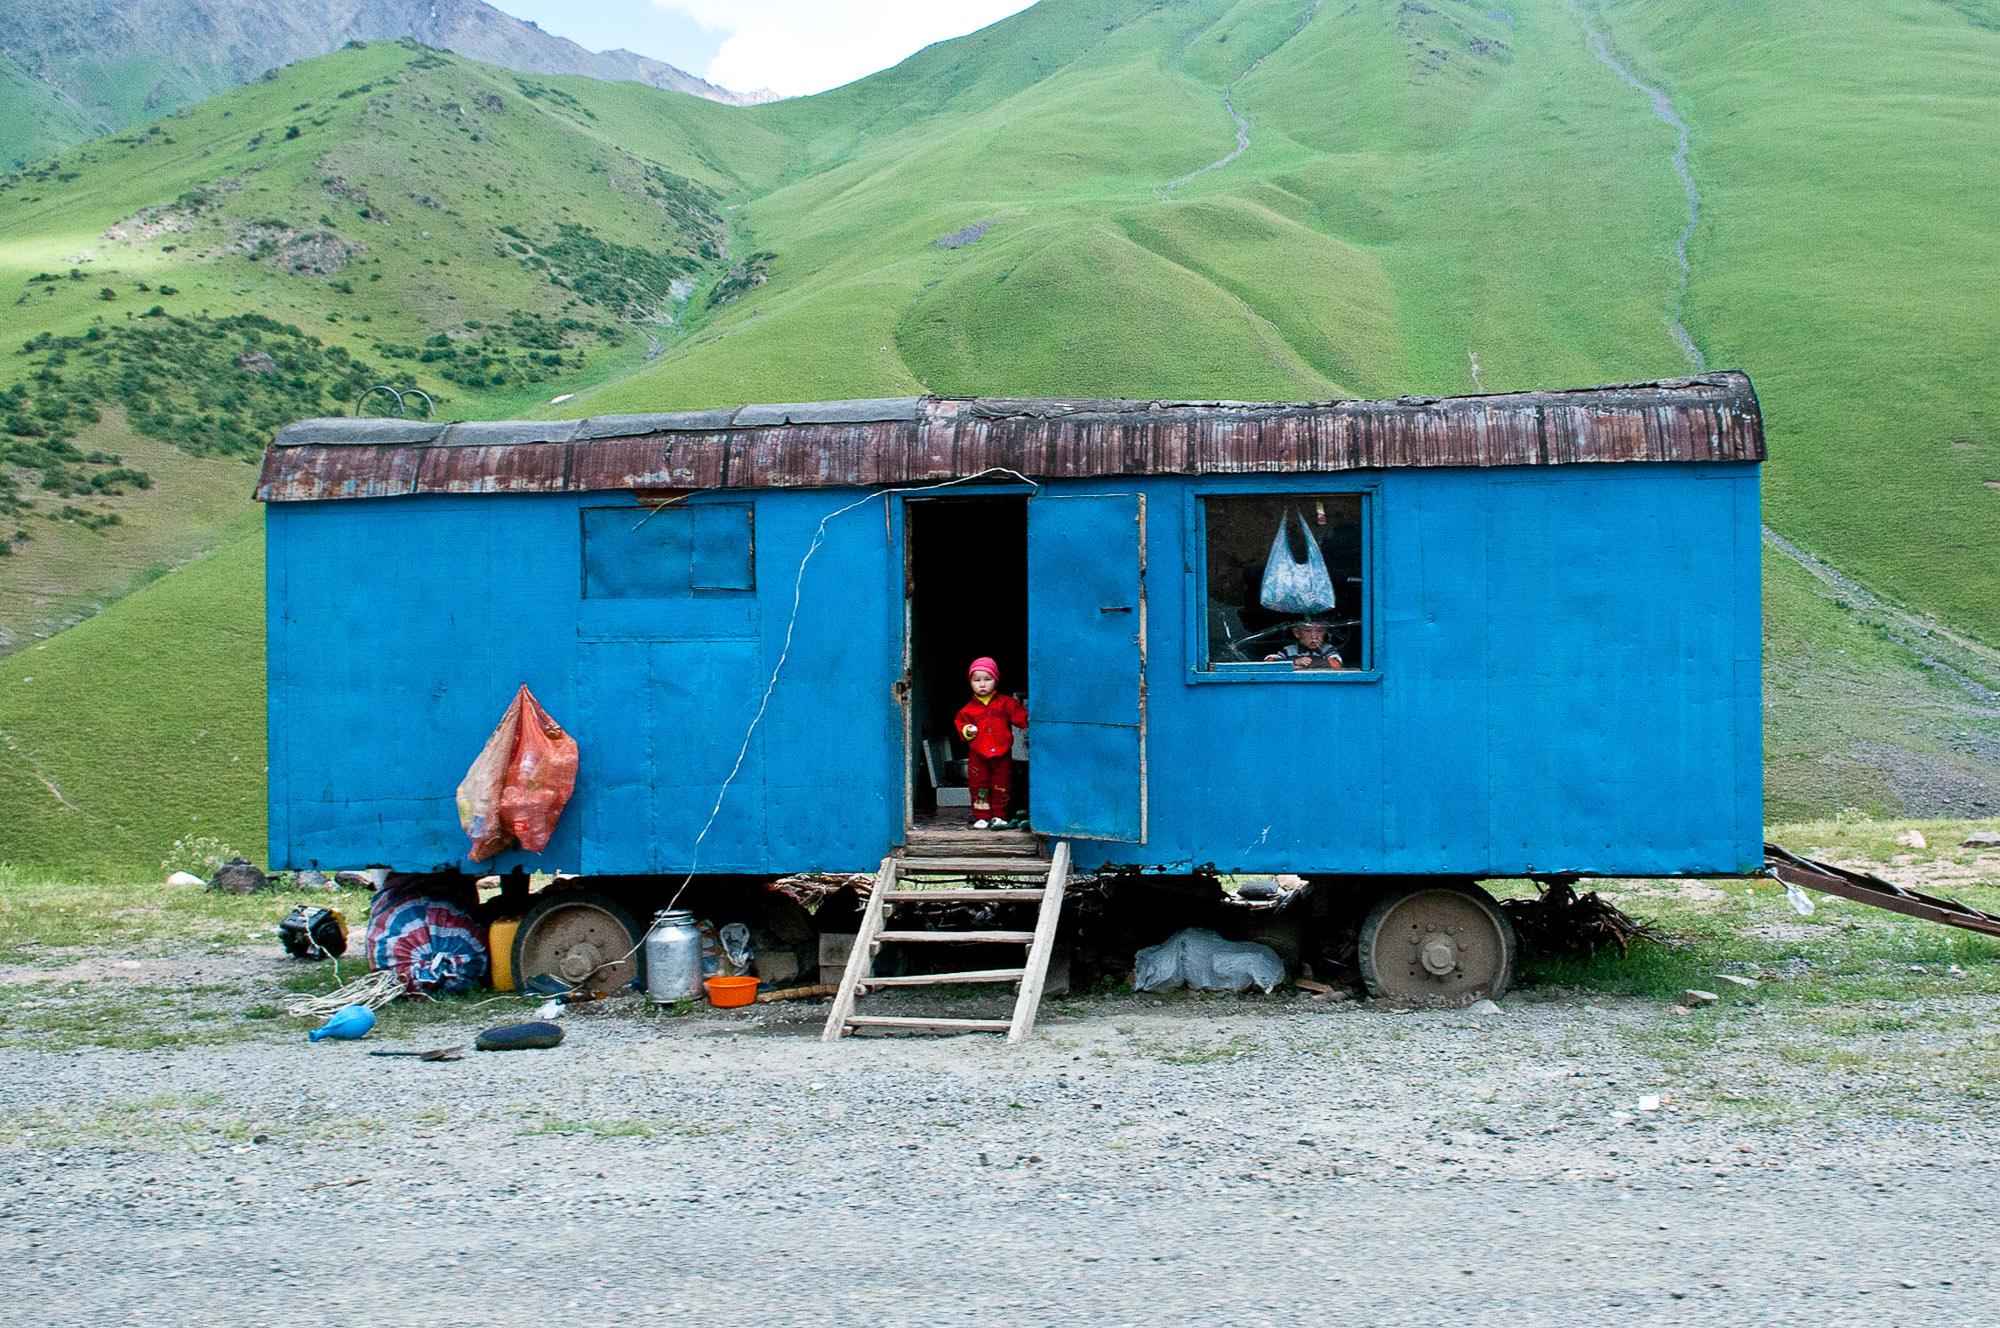 Somewhere in Kyrgyzstan. © www.thomaspickard.com